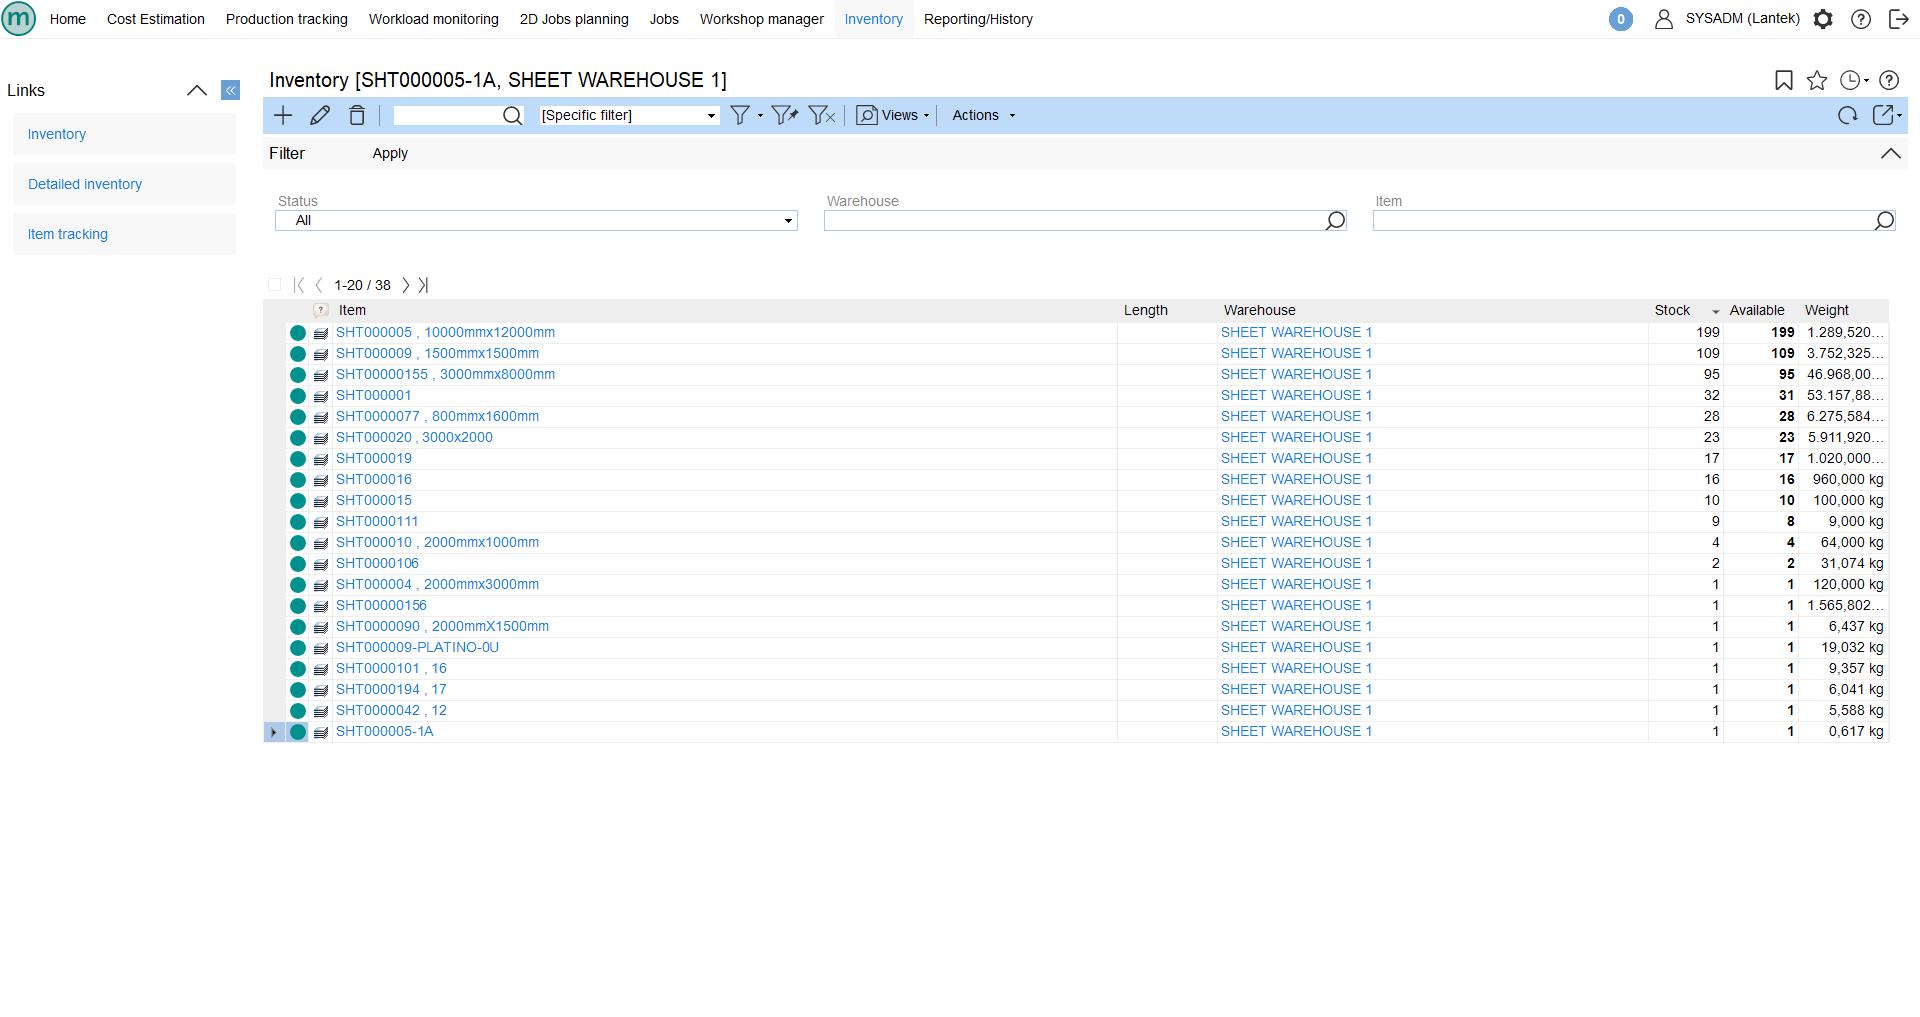 Lantek Integra Inventory  - 자재 목록